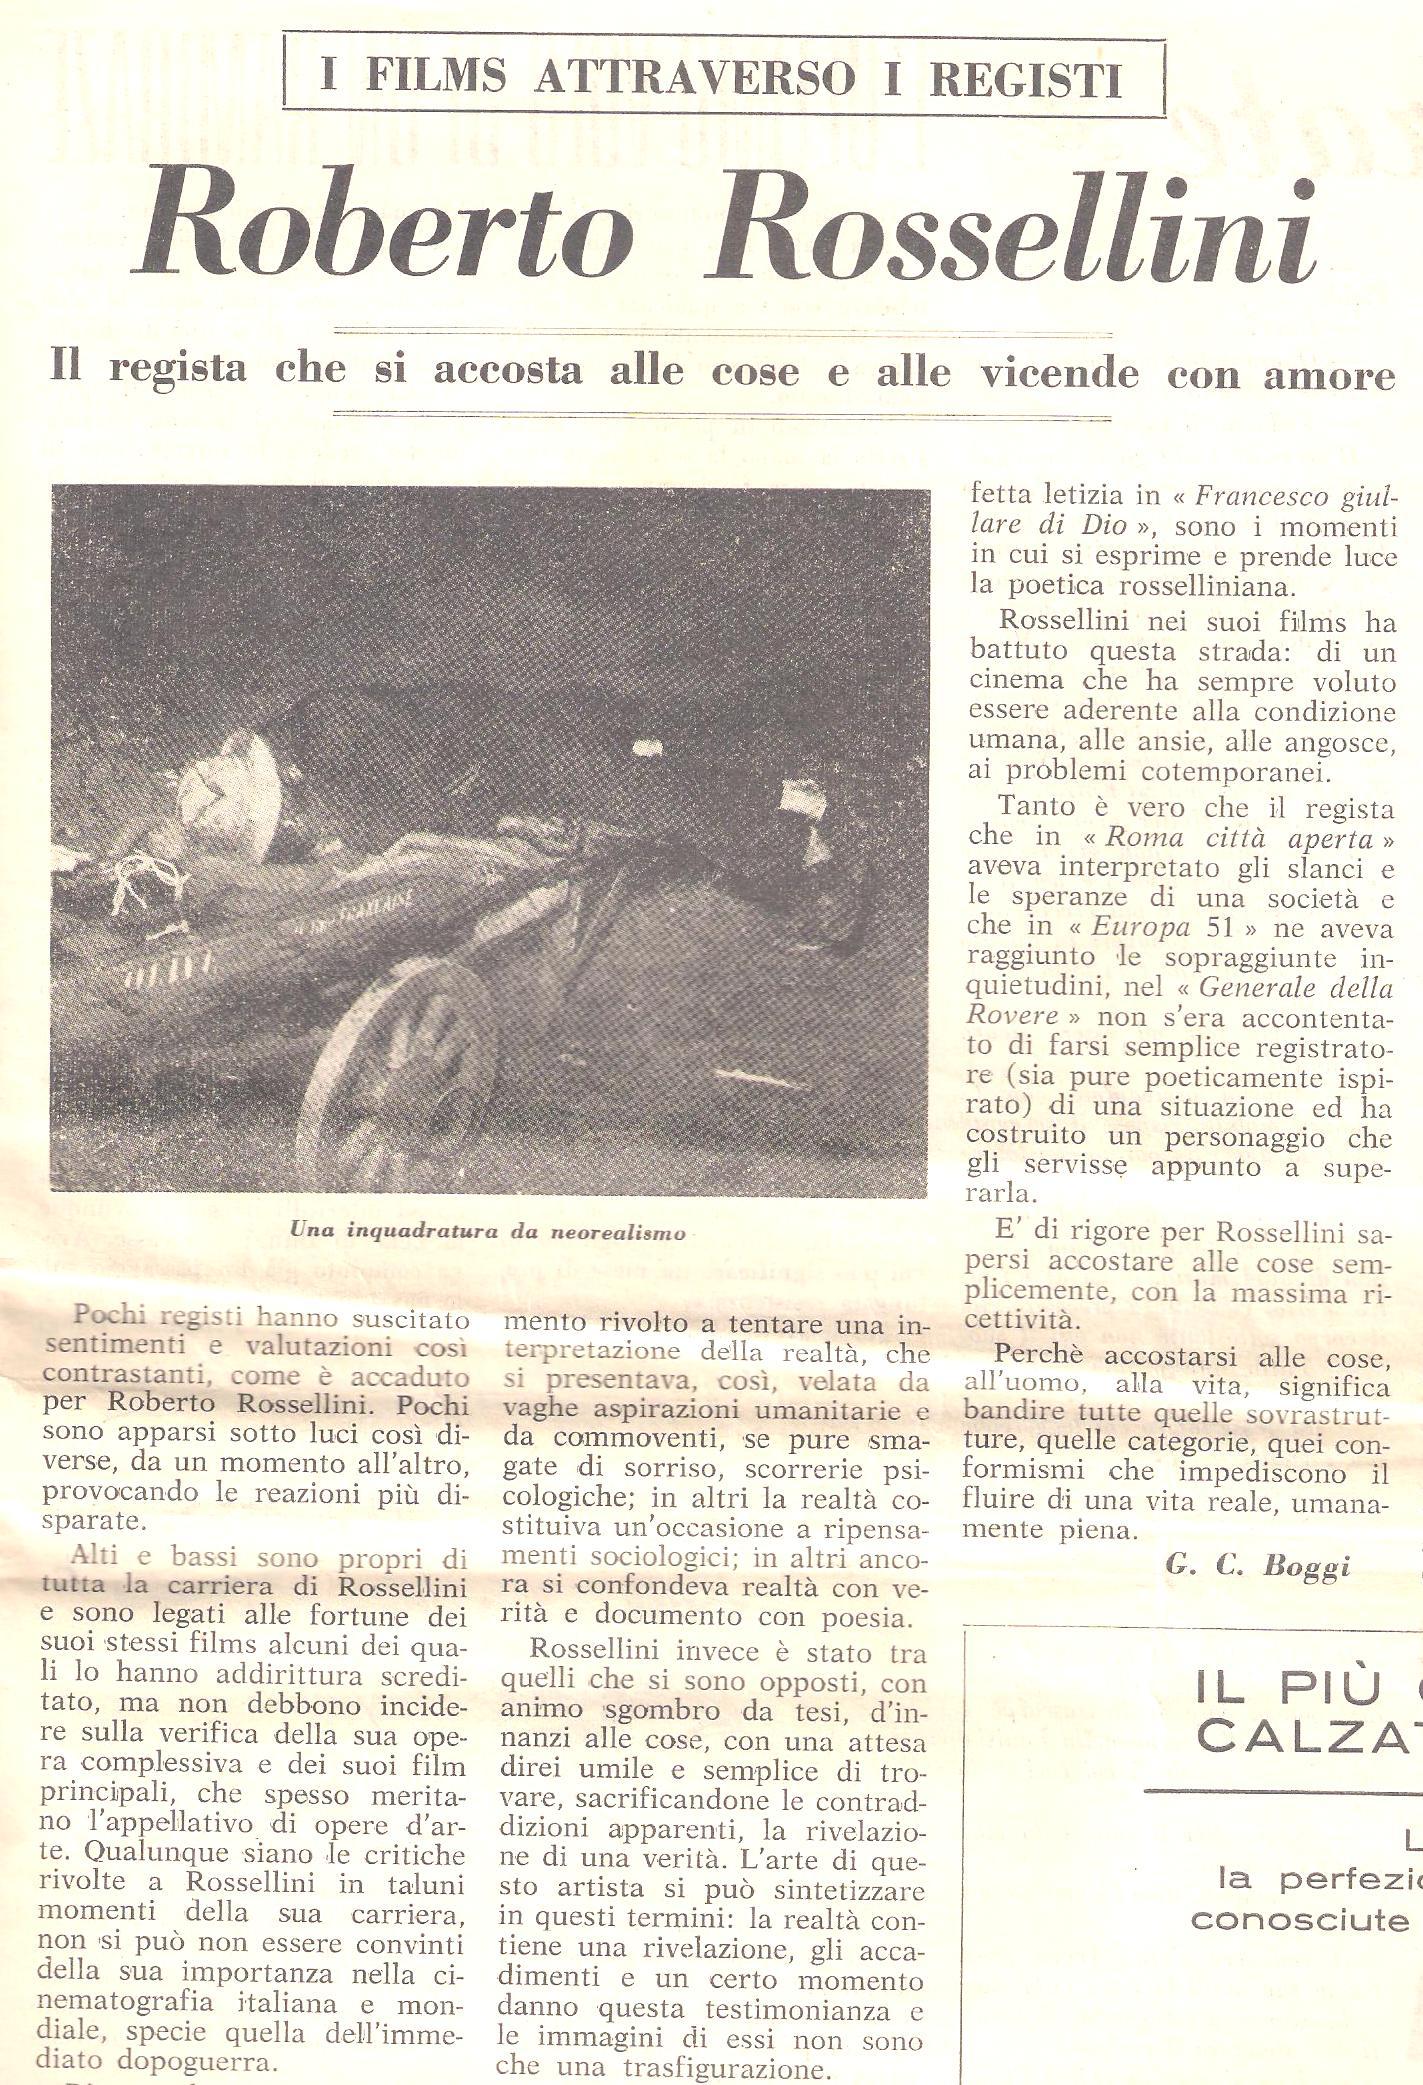 Roberto Rossellini 1 001